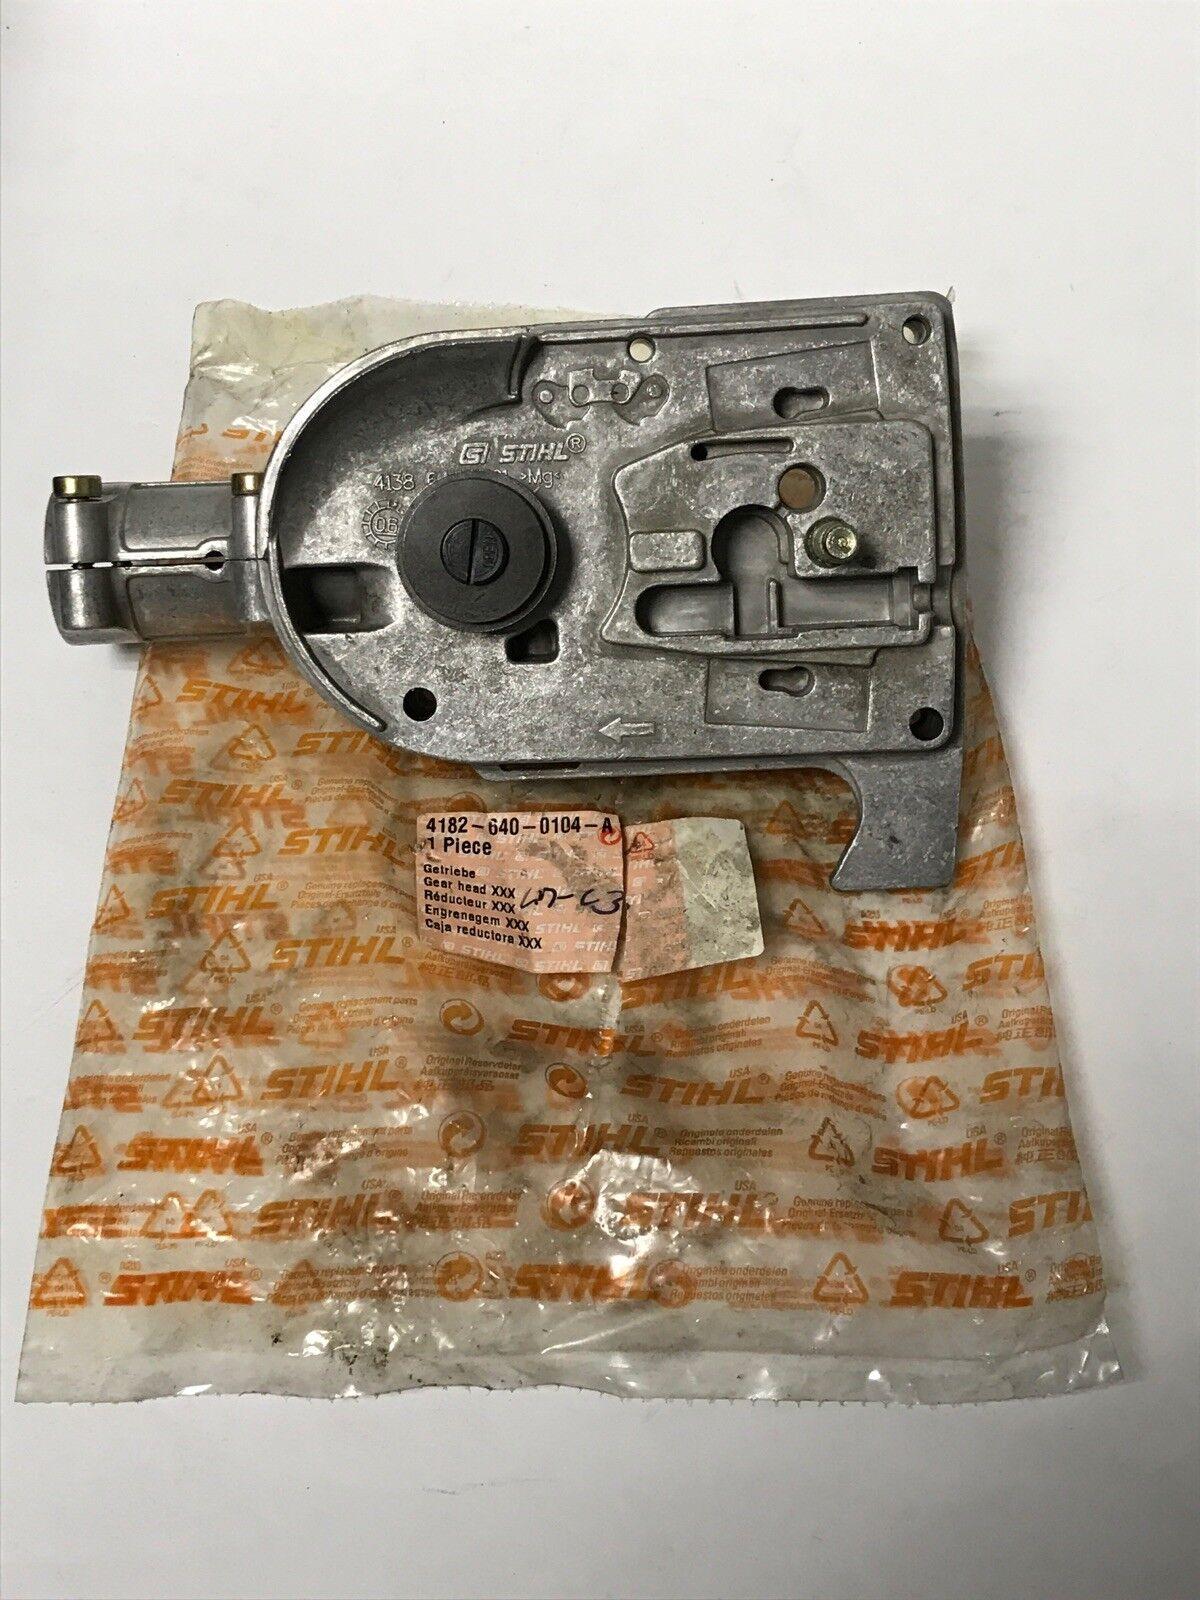 Nuevo Original Equipment Manufacturer STIHL KM HT HT130 FS90 110 130 polos Motosierra Gear Head 4182-640-0104